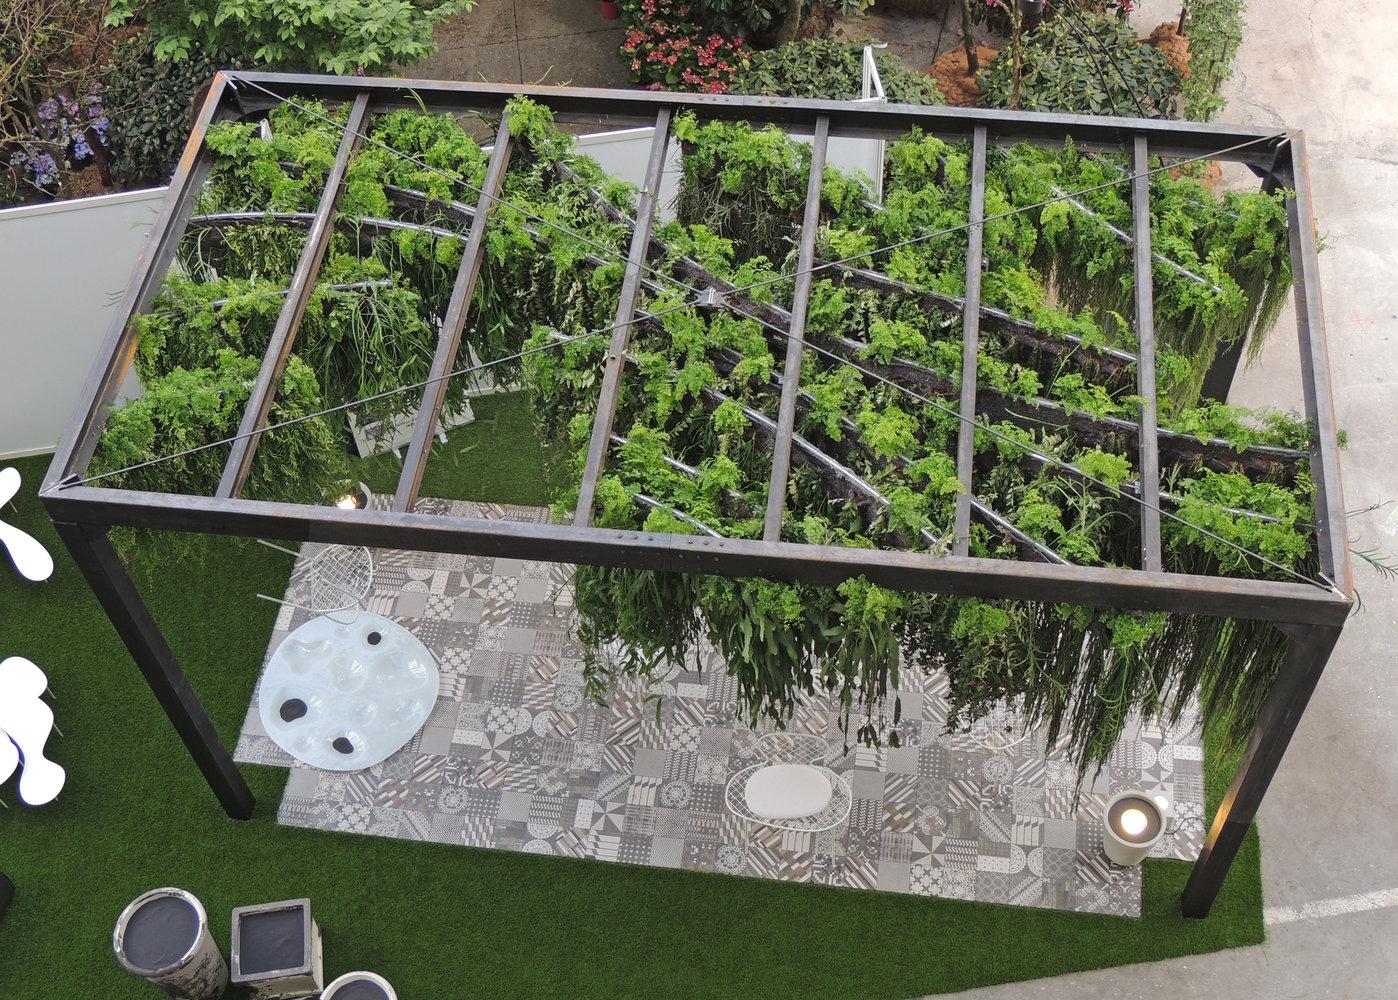 le ciel vert pour my design l art du jardin grand. Black Bedroom Furniture Sets. Home Design Ideas